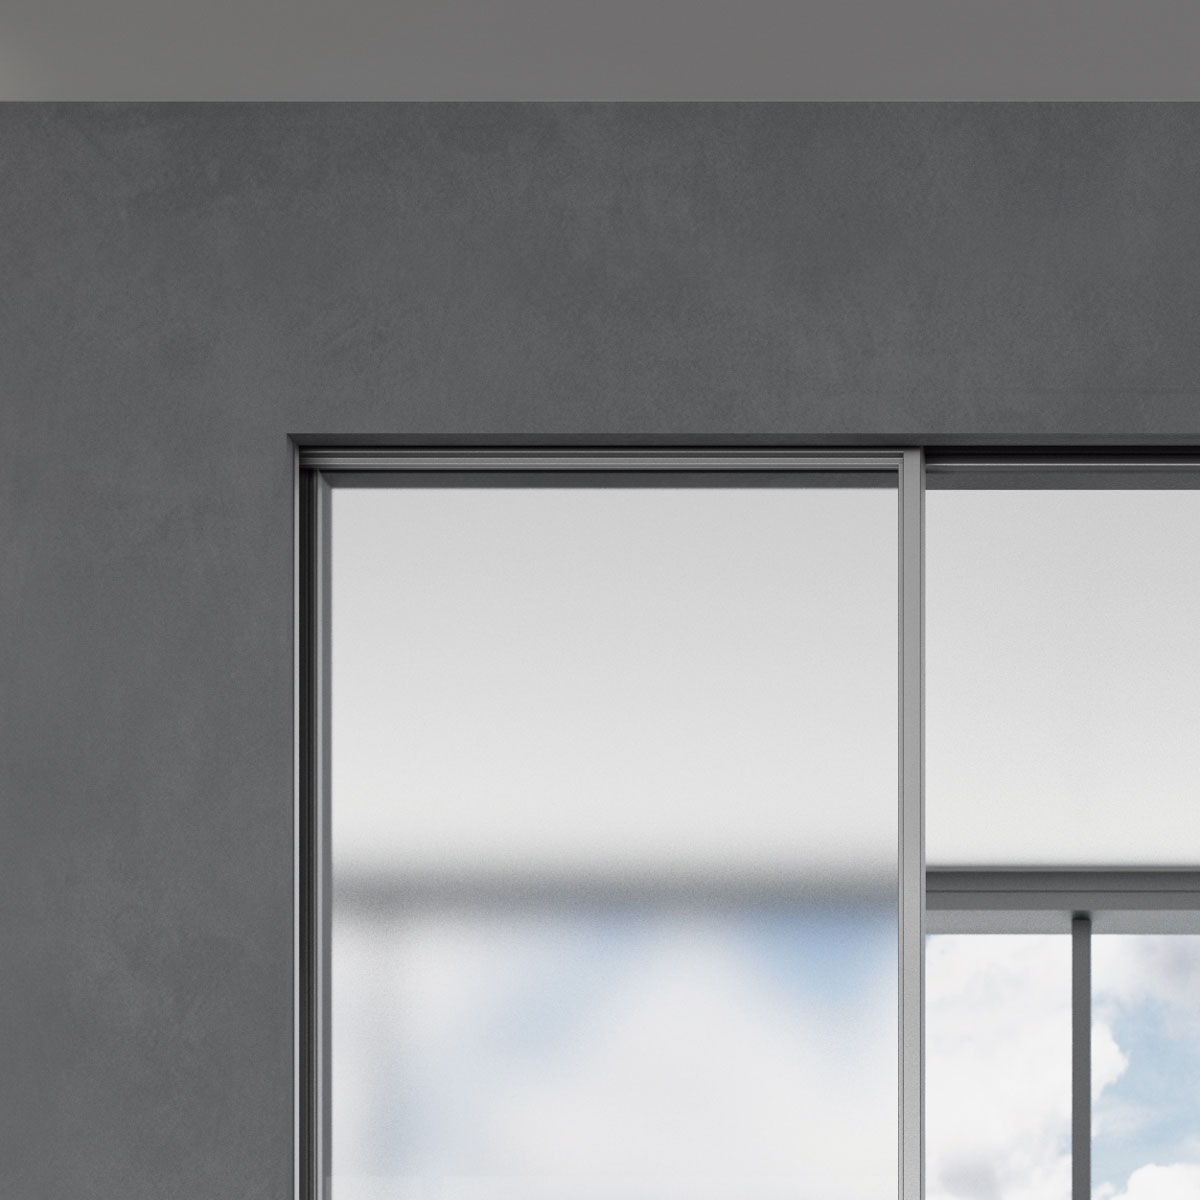 Imagen 4 BK-10 kit puerta corredera